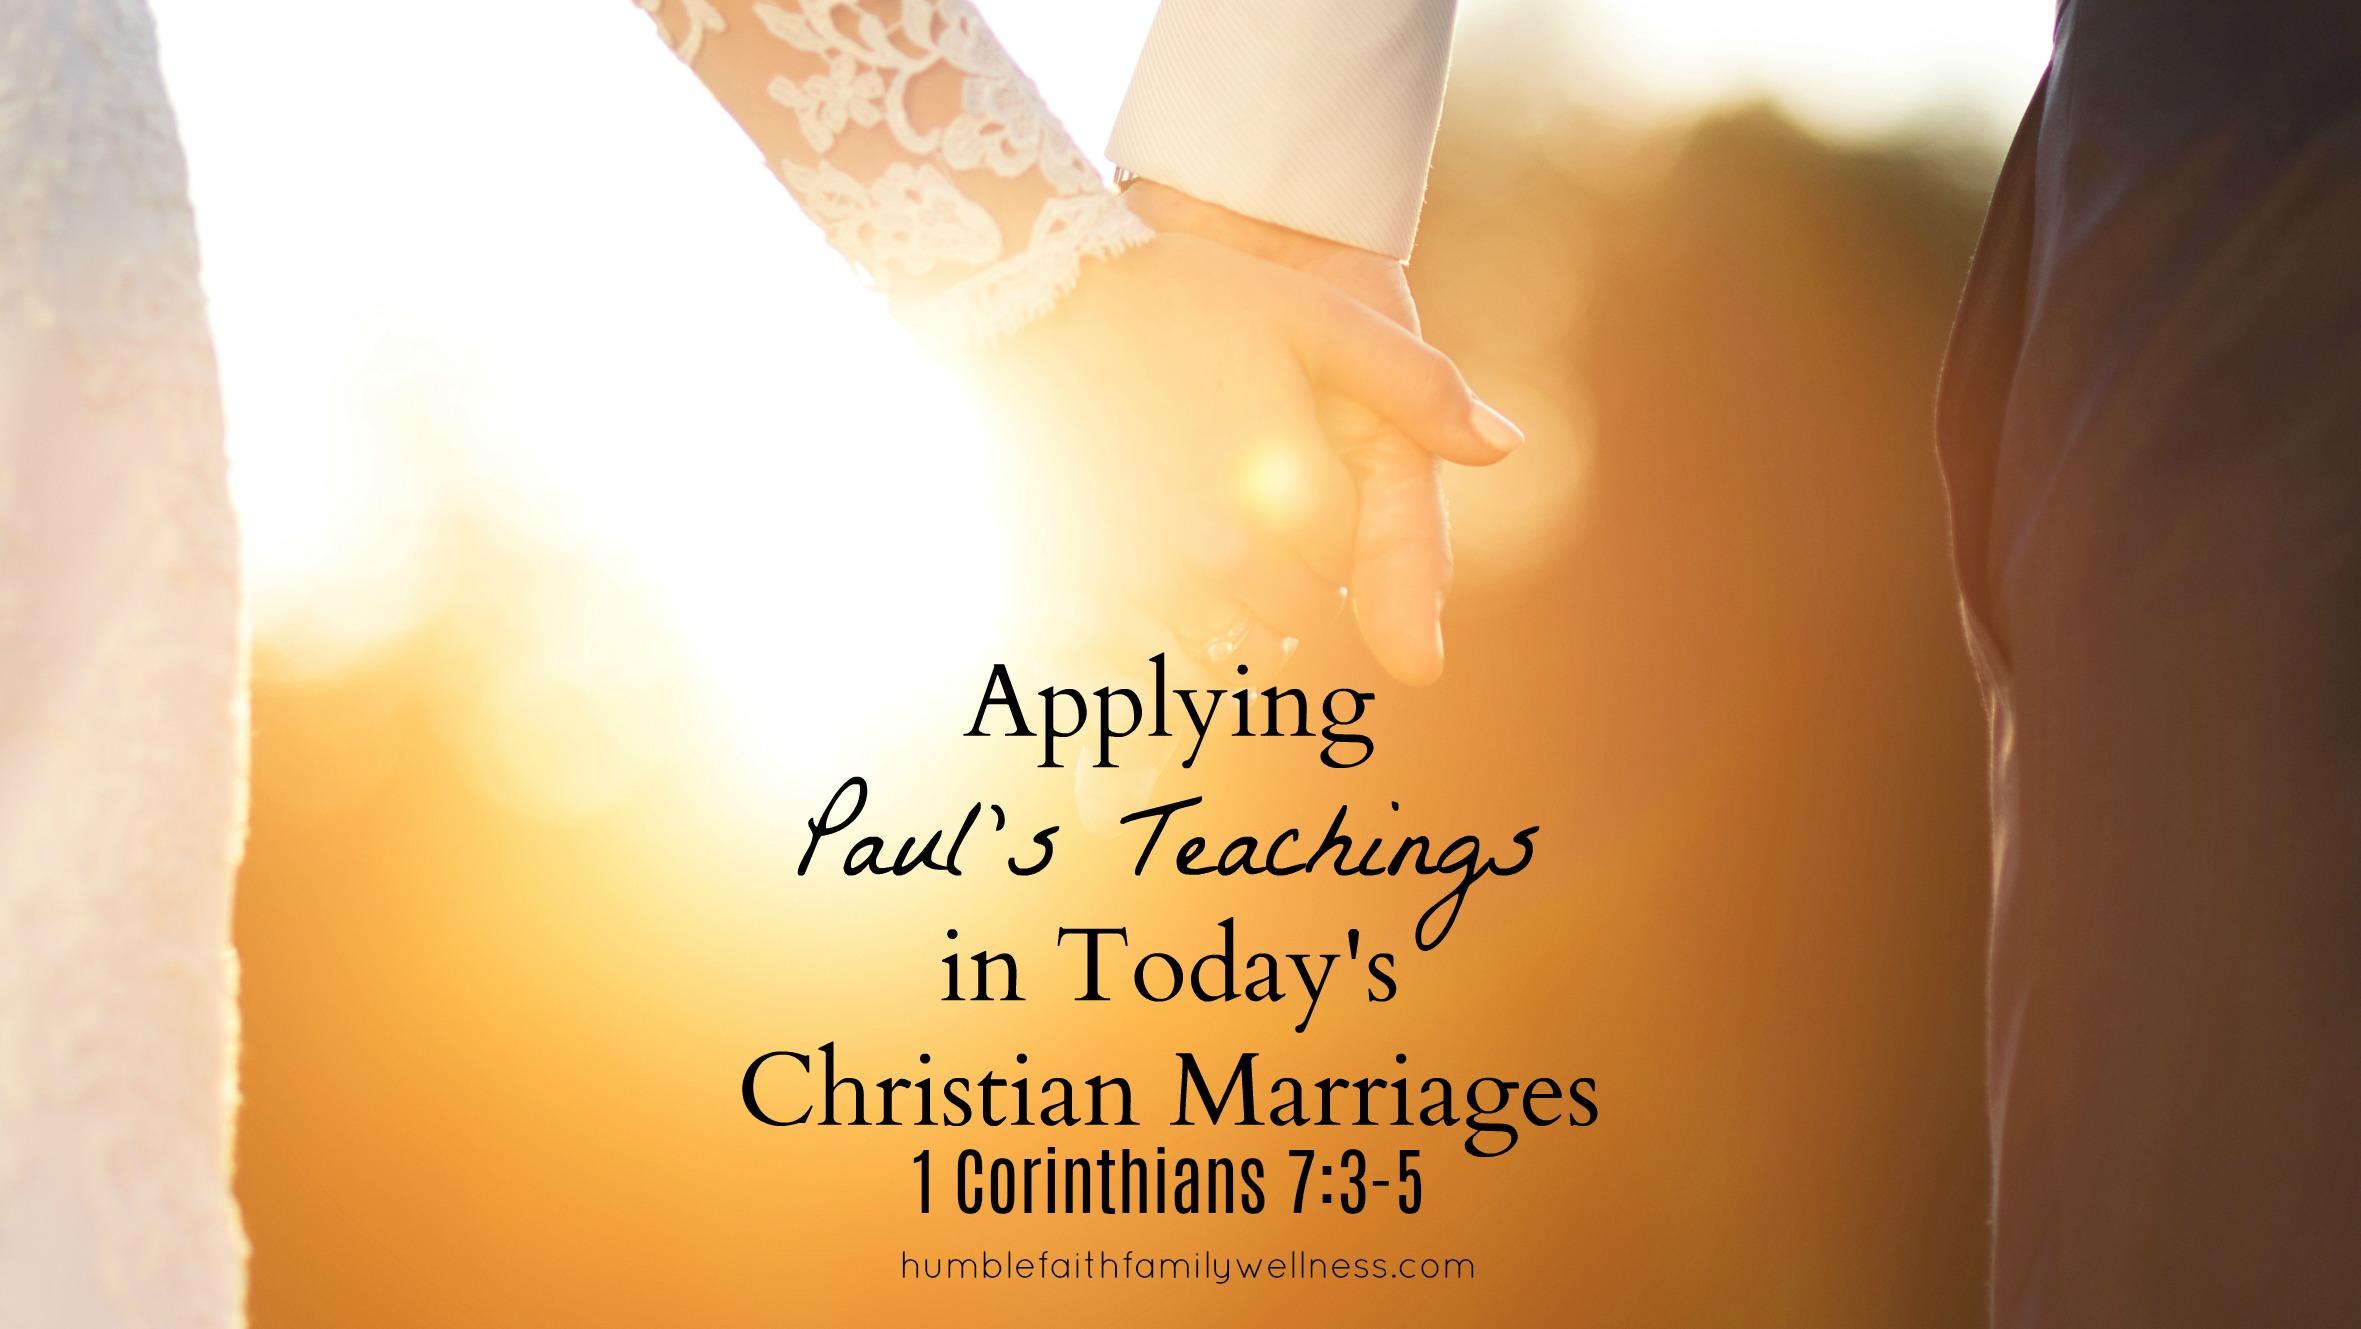 Christian marriages, Paul's teachings, 1 Corinthians 7